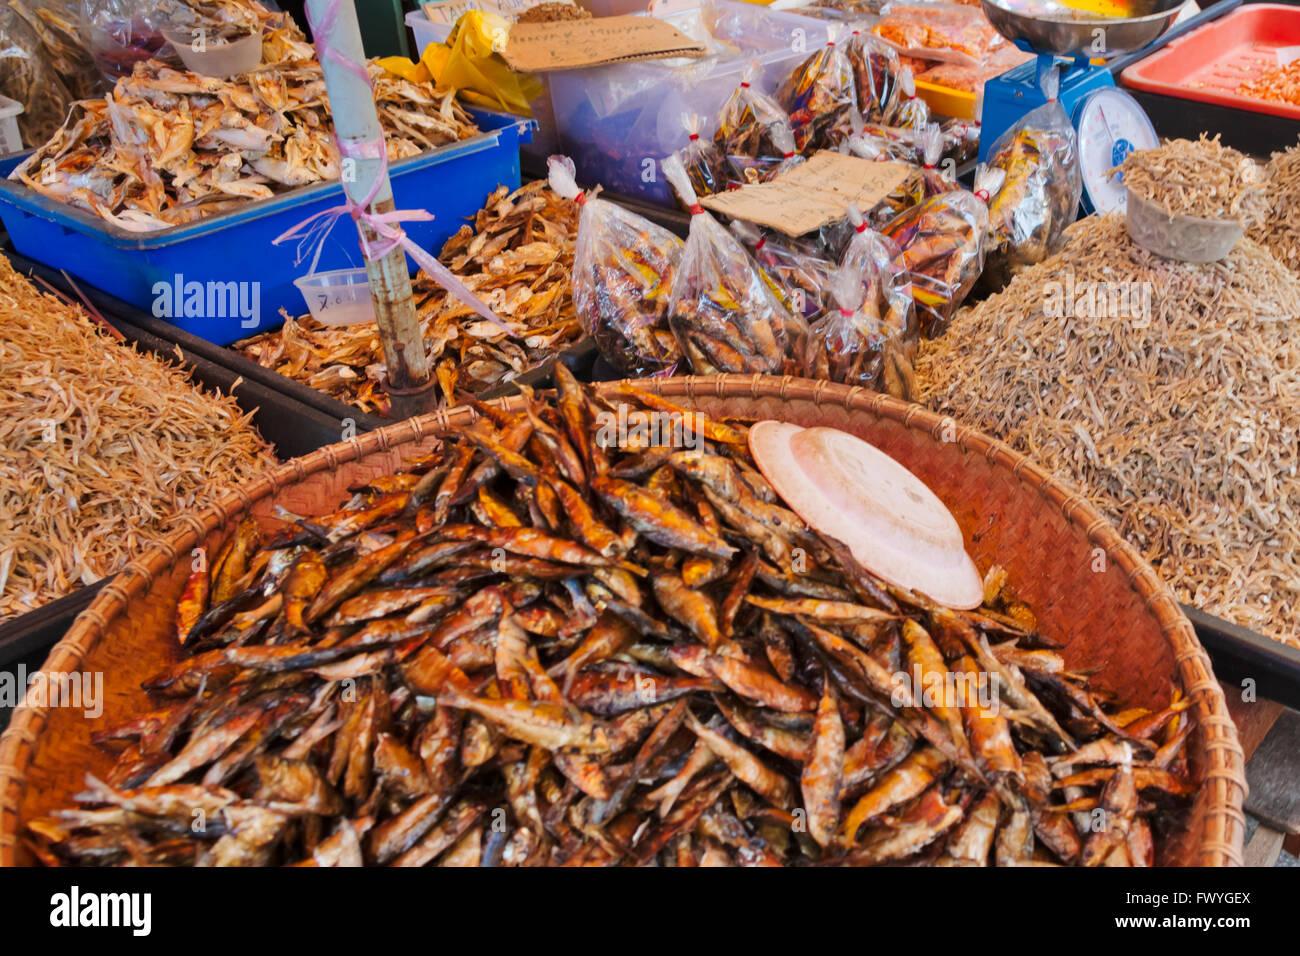 Fish market, Bandar Seri Begawan, Brunei - Stock Image